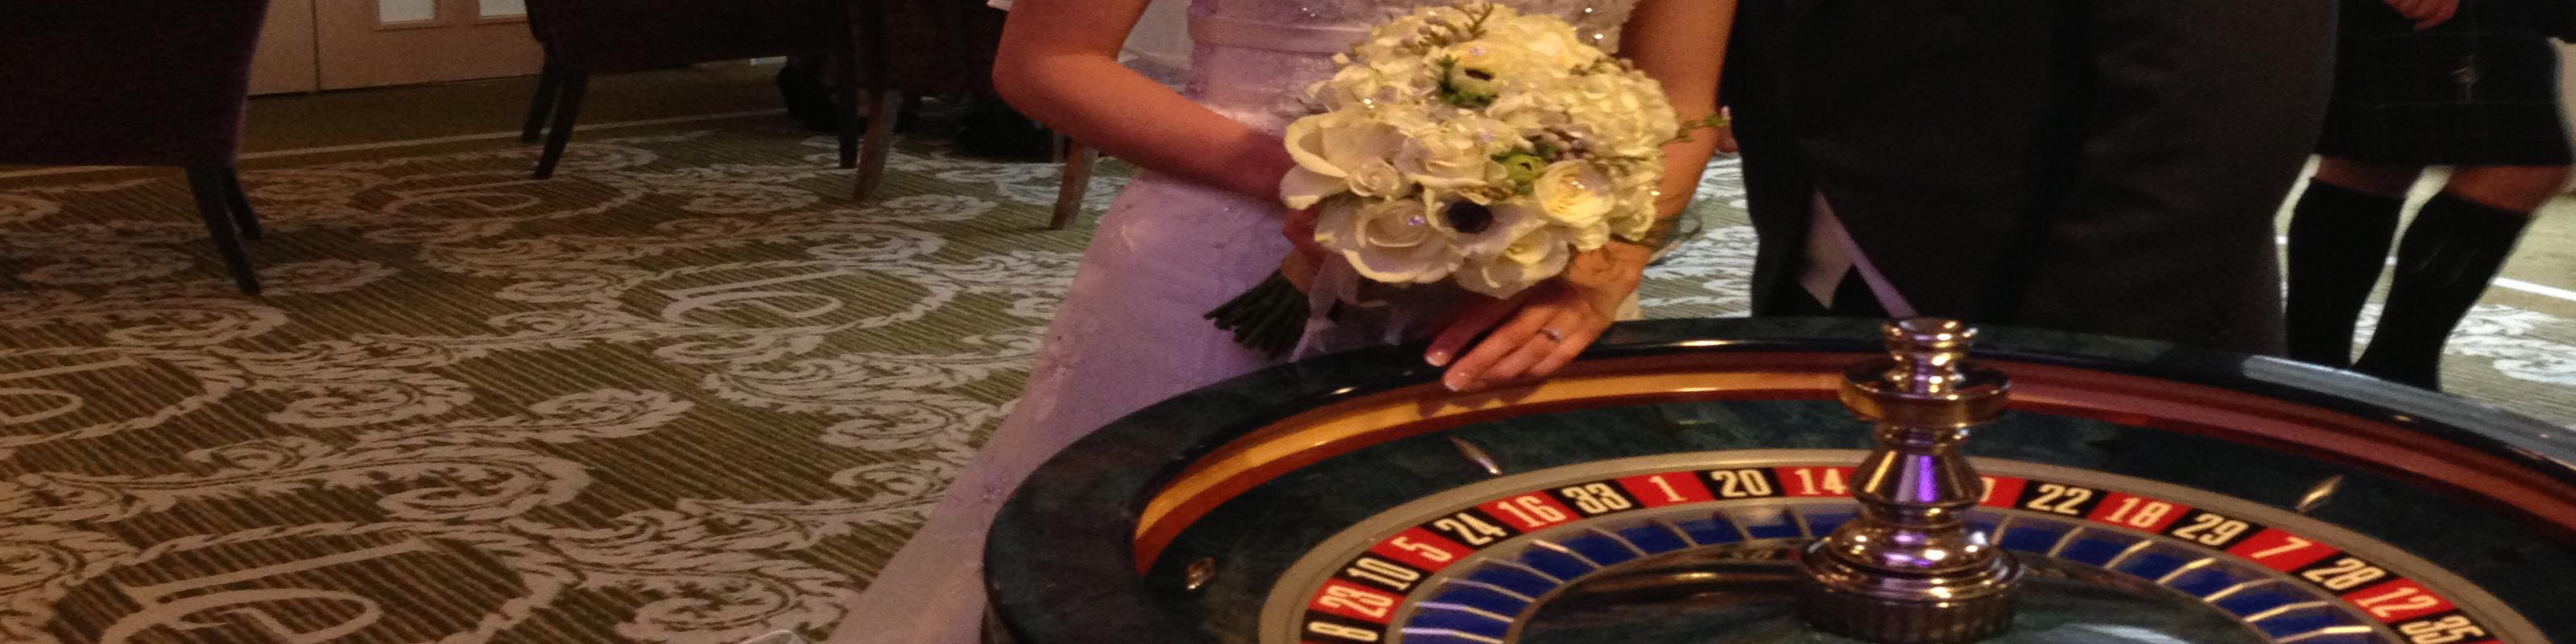 Casino dublin blackjack